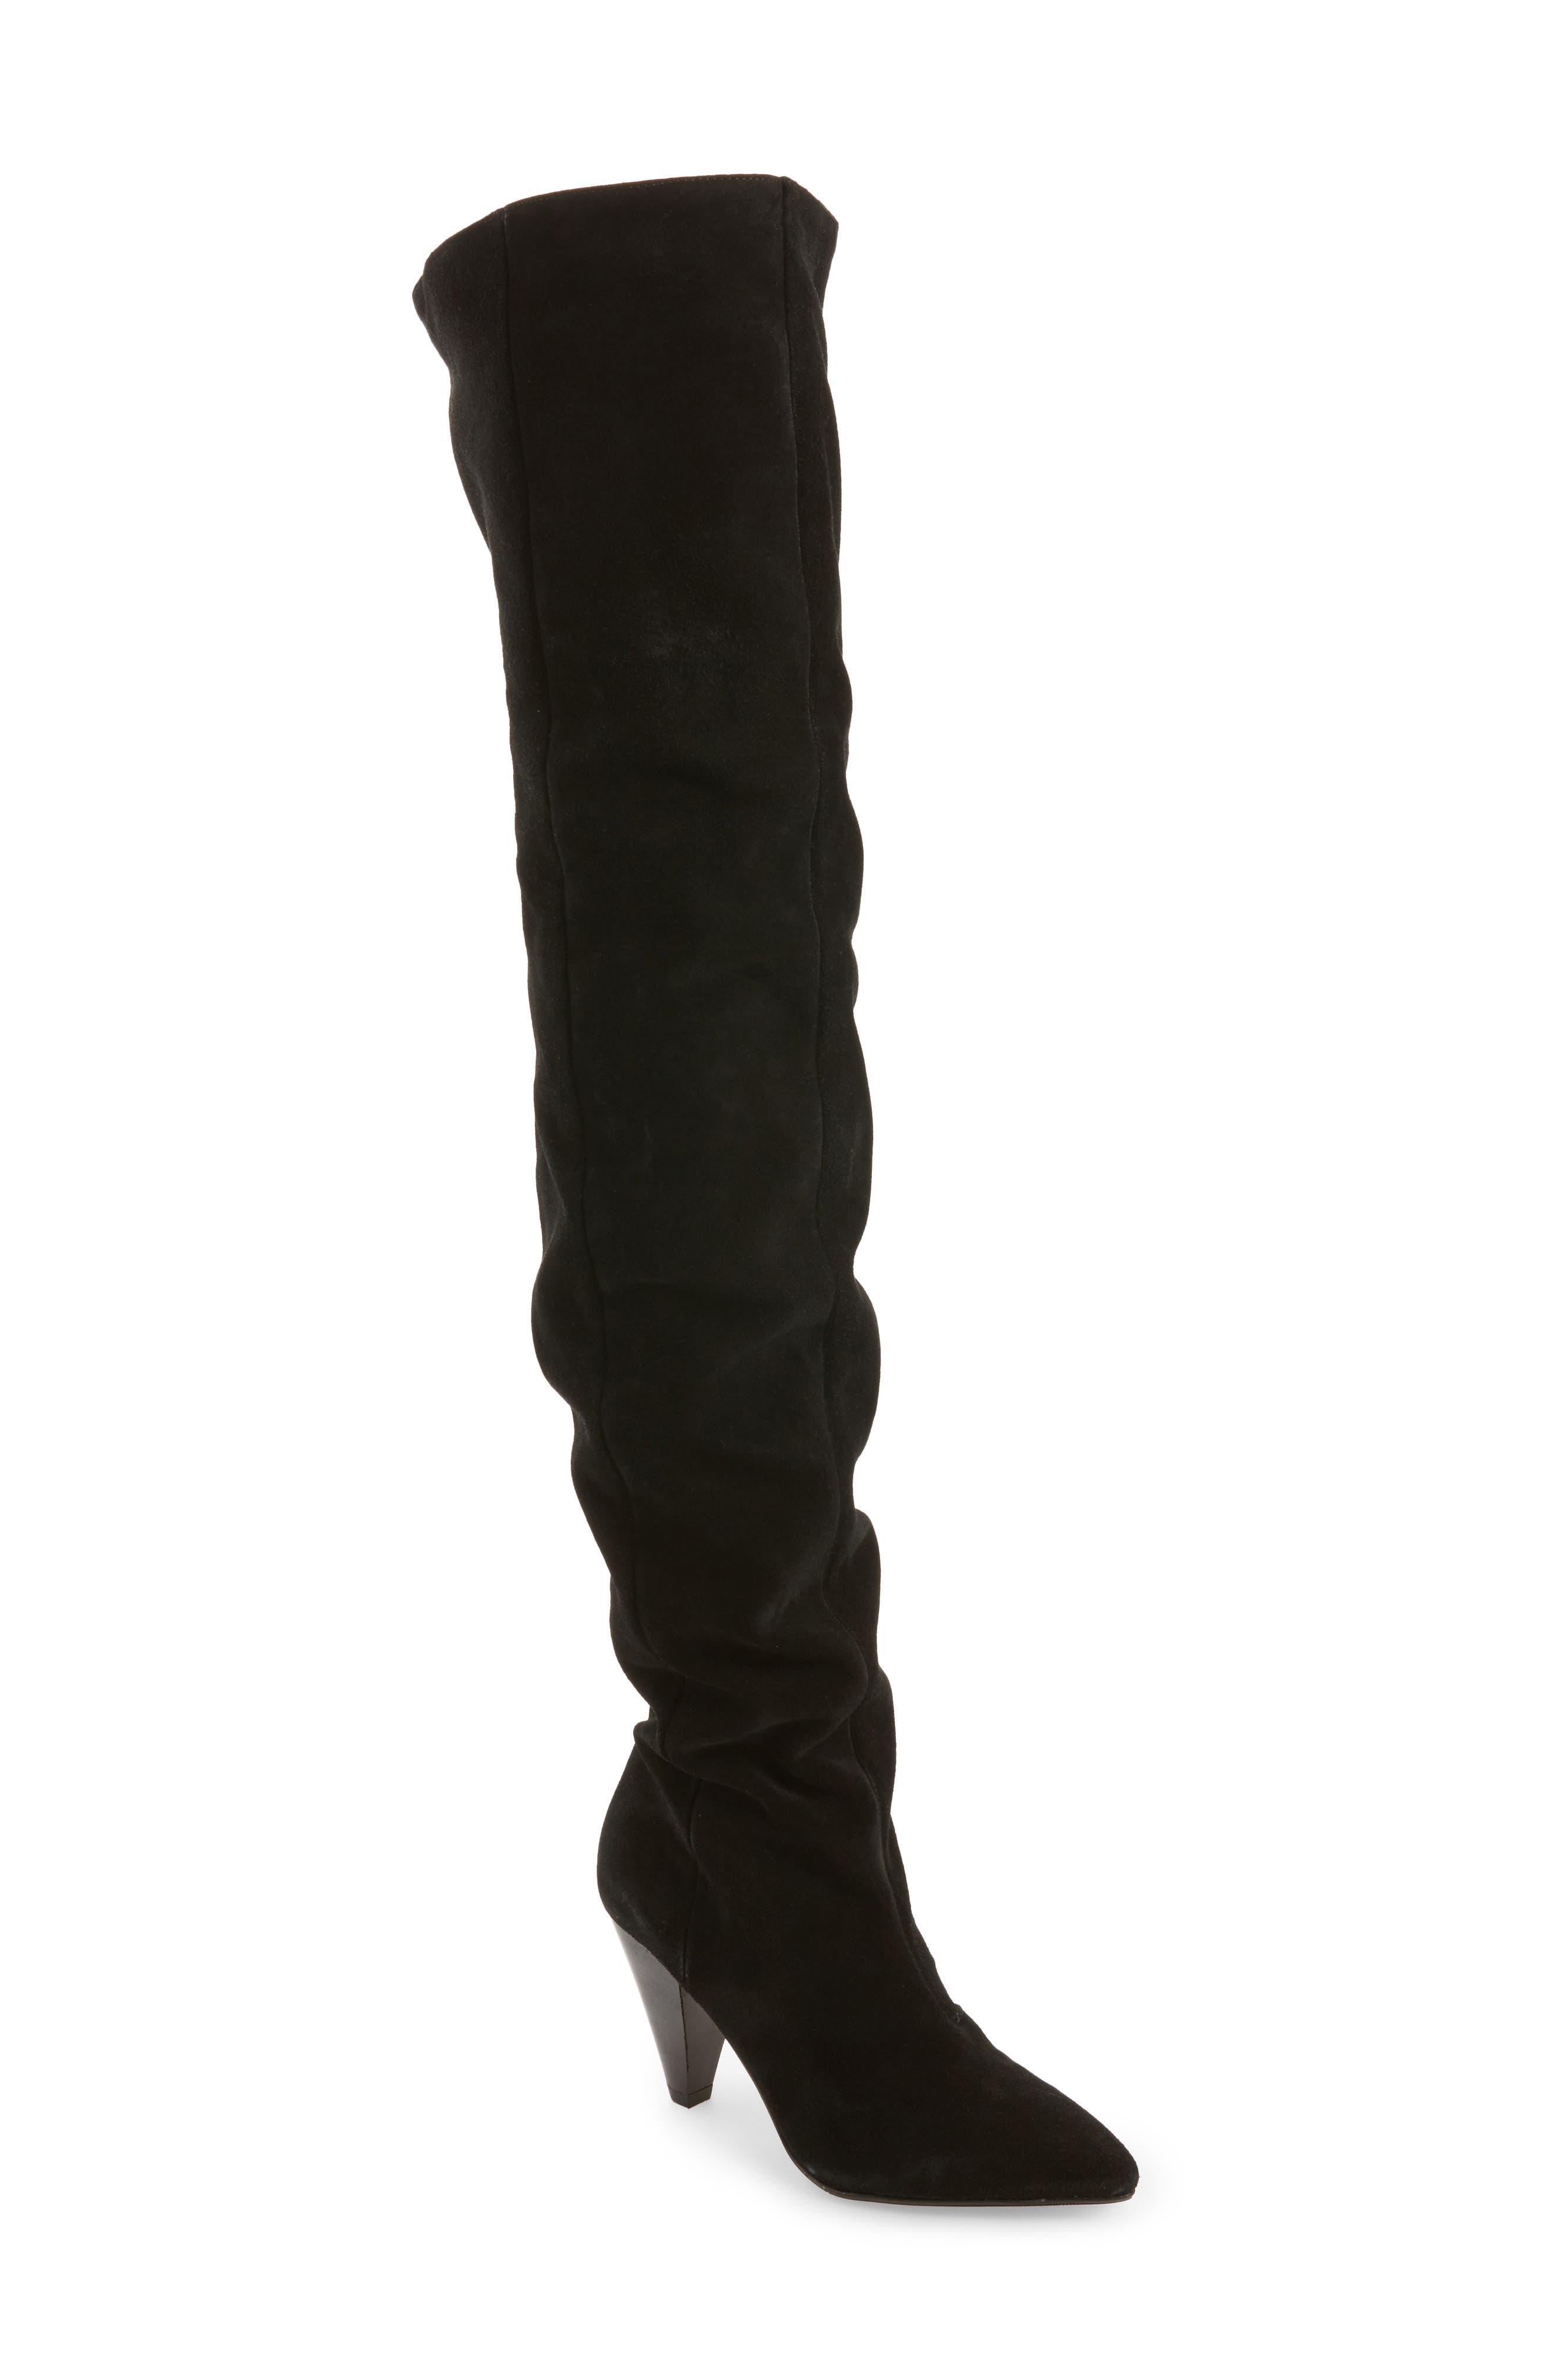 Main Image - Topshop Boxer Thigh High Boots (Women)